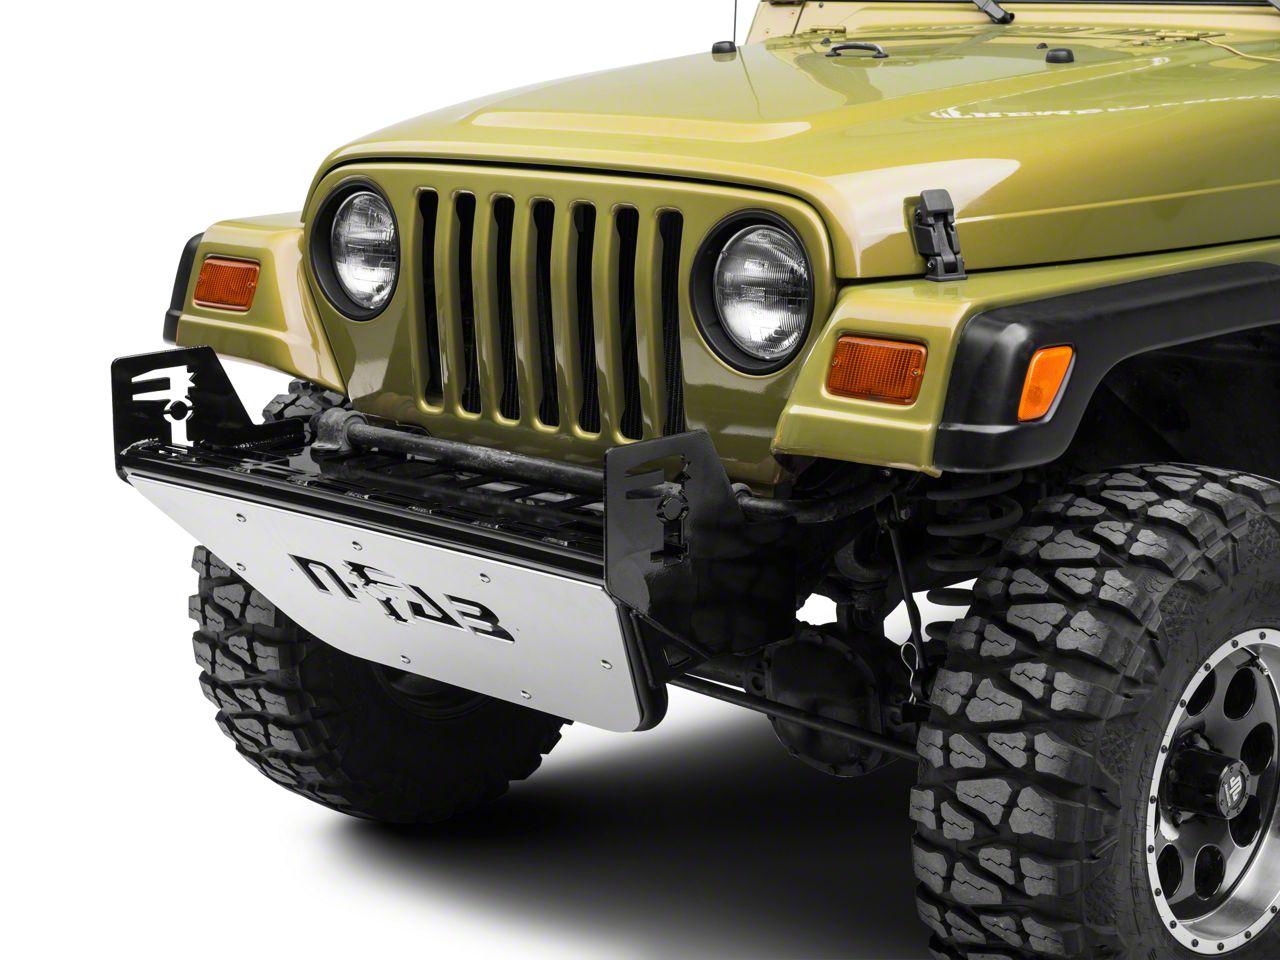 N-Fab RSP Front Bumper - Gloss Black w/ Multi-Mount System (97-06 Jeep Wrangler TJ)